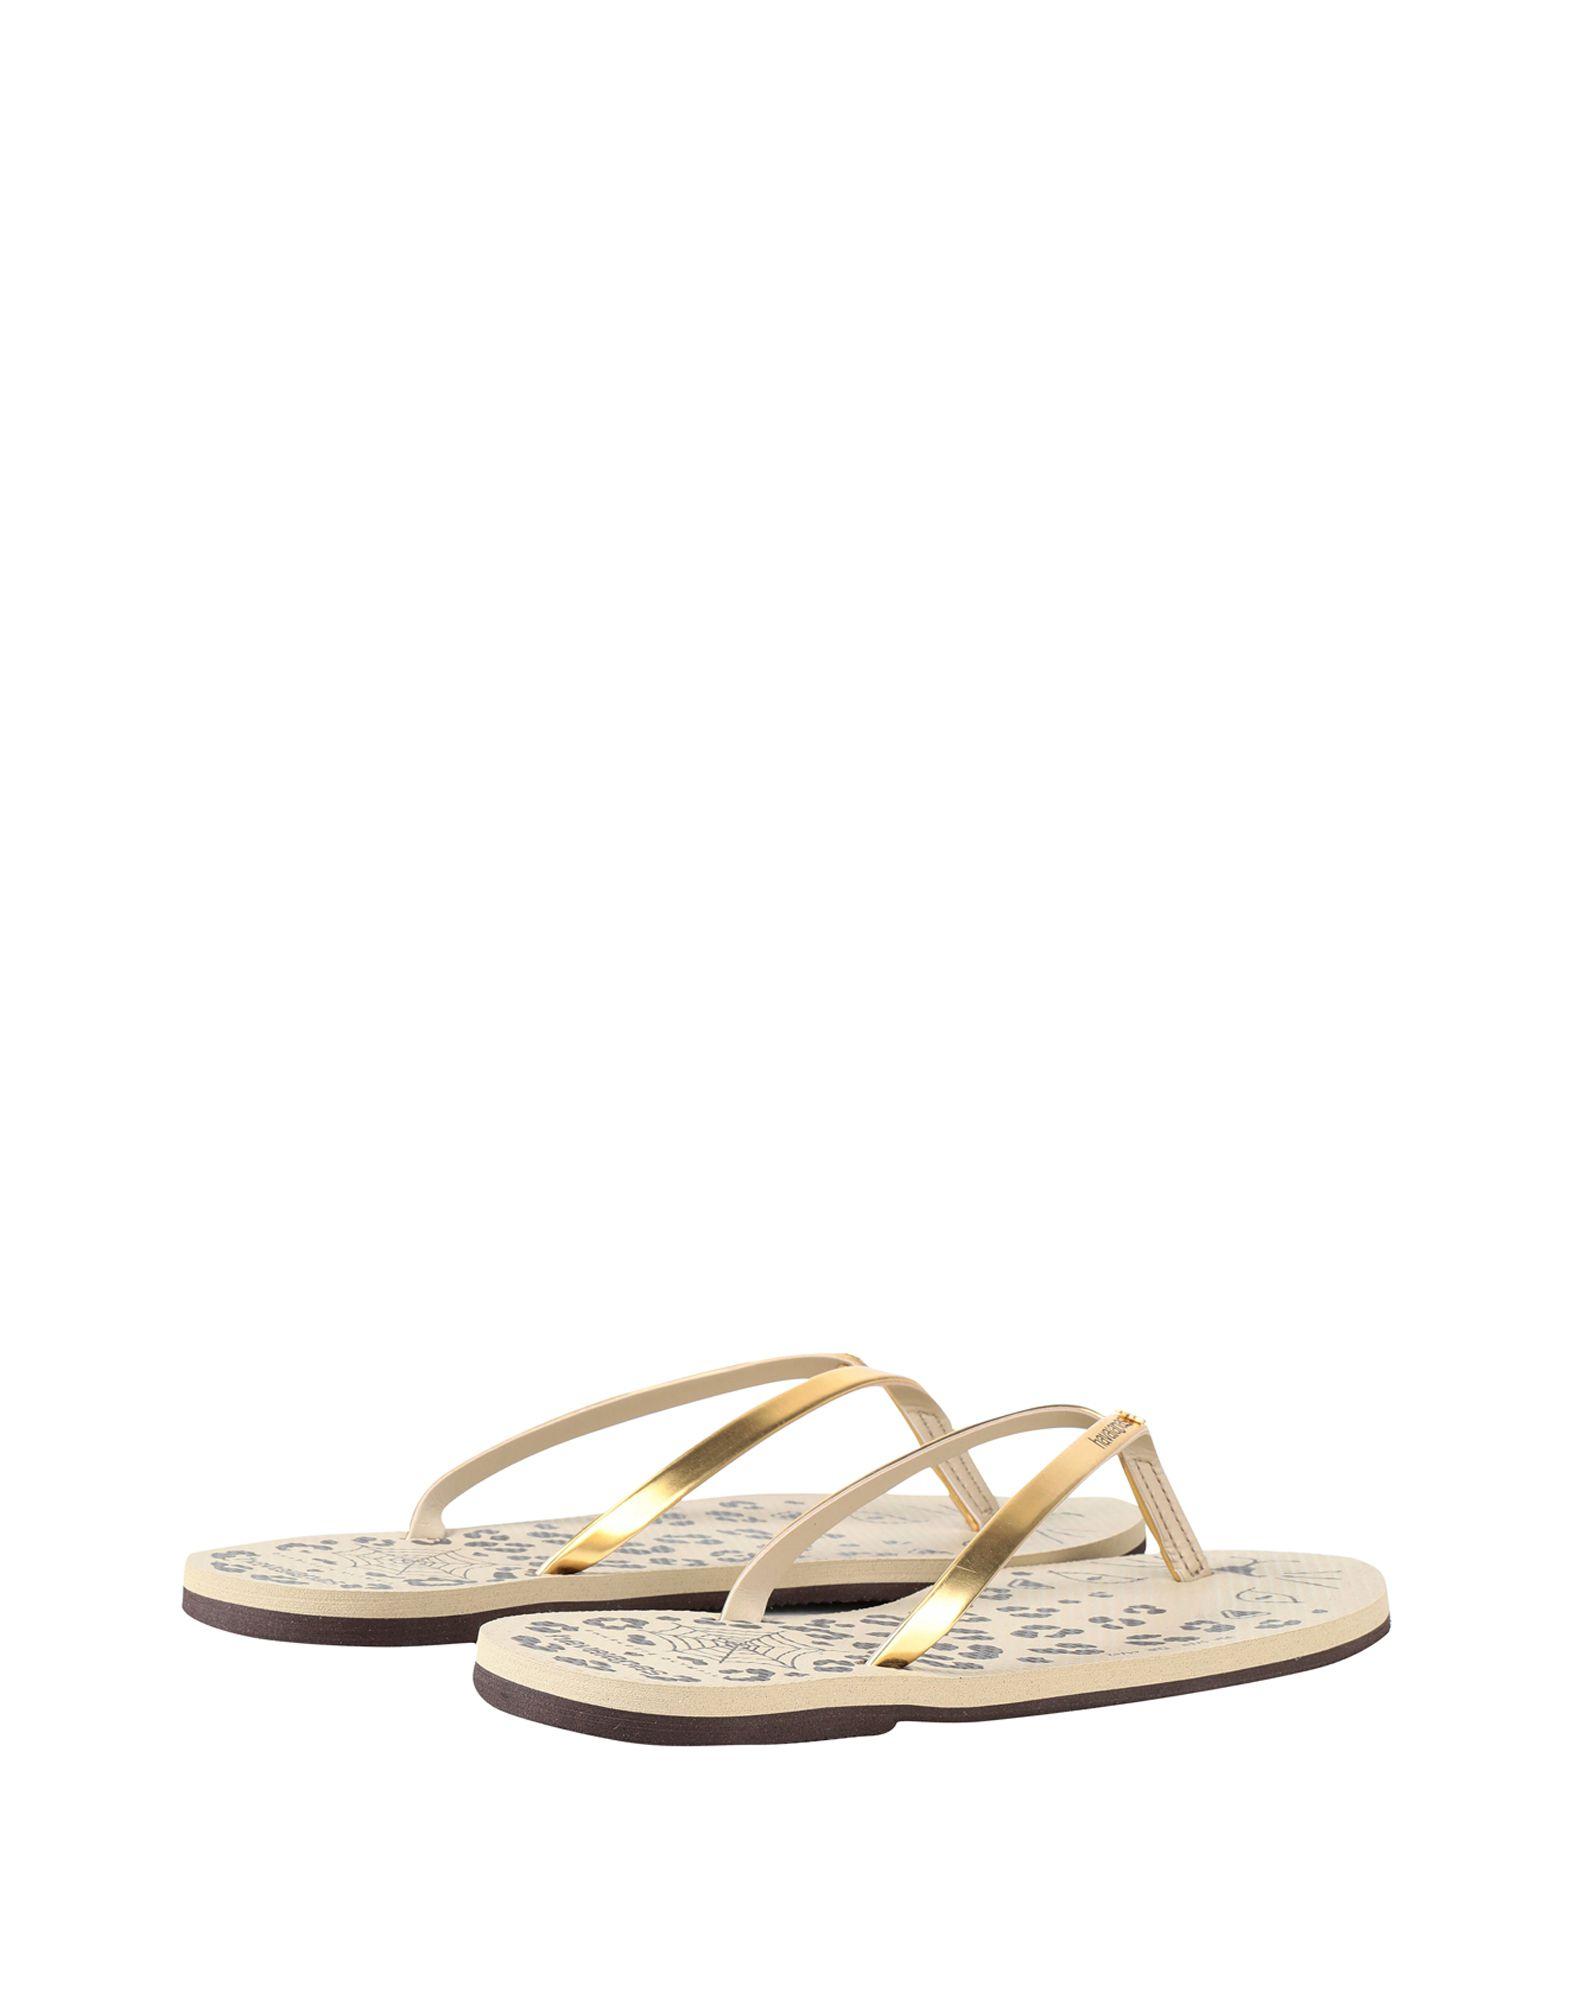 Charlotte Olympia  Loves Havaianas Dianetten Damen  Olympia 11524358XK Gute Qualität beliebte Schuhe 41465f